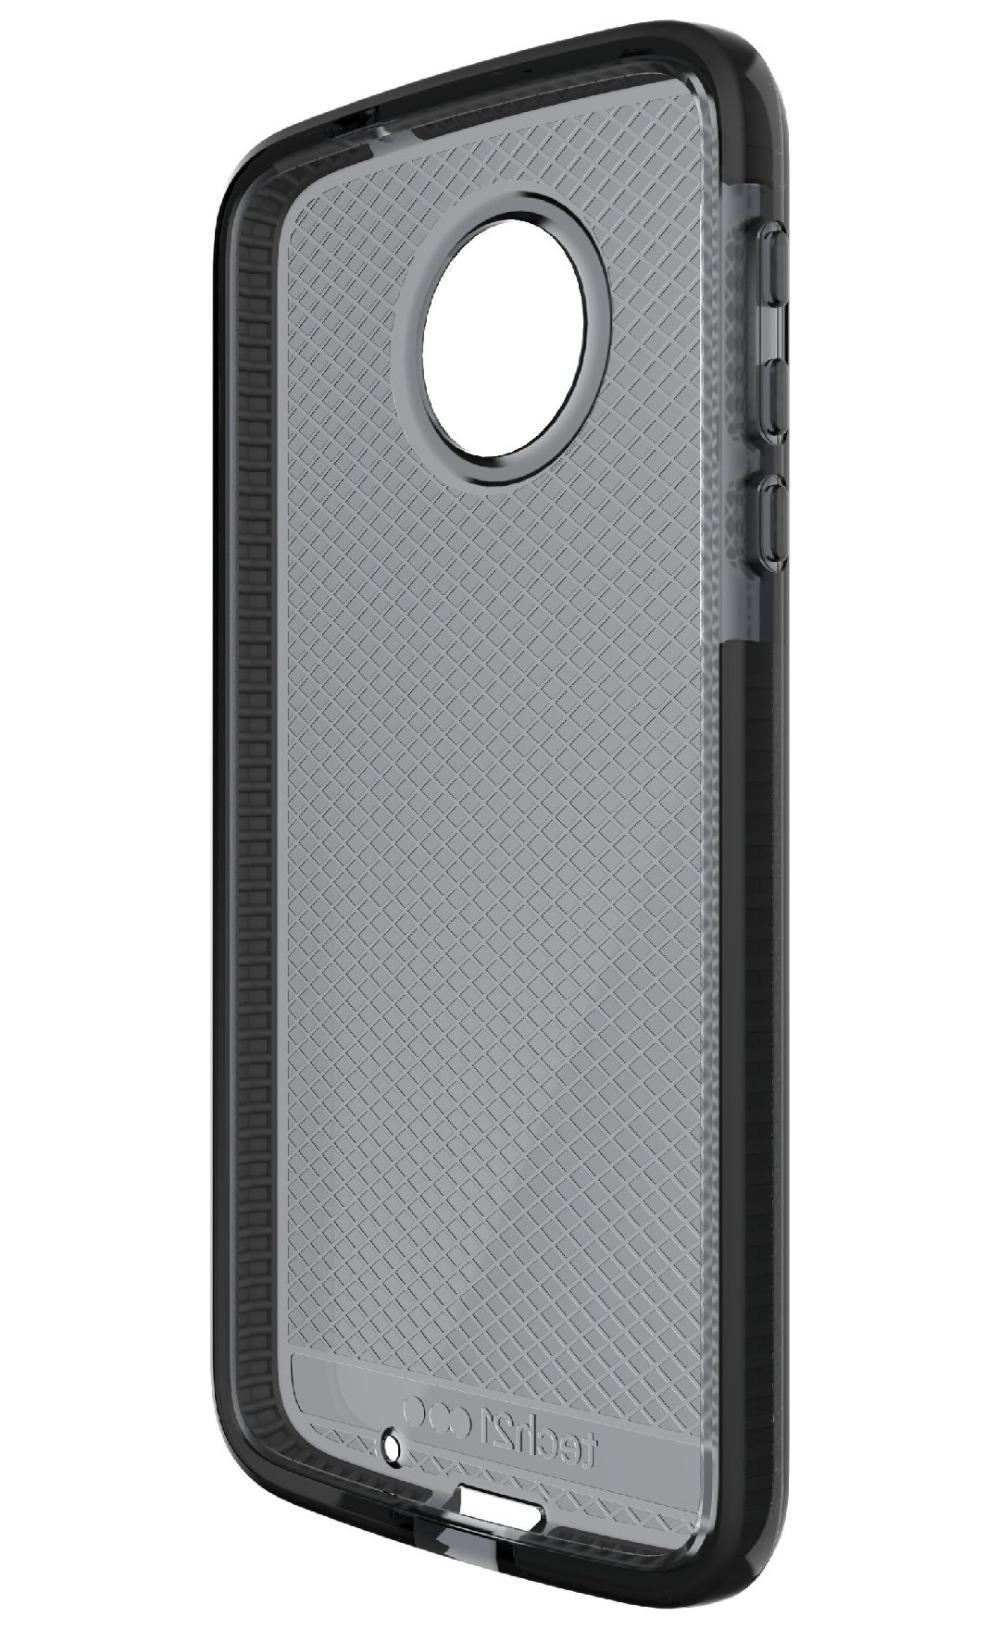 6 X **NEW** Phone Cases, Electronics and More (Tech21,UTStarcom)